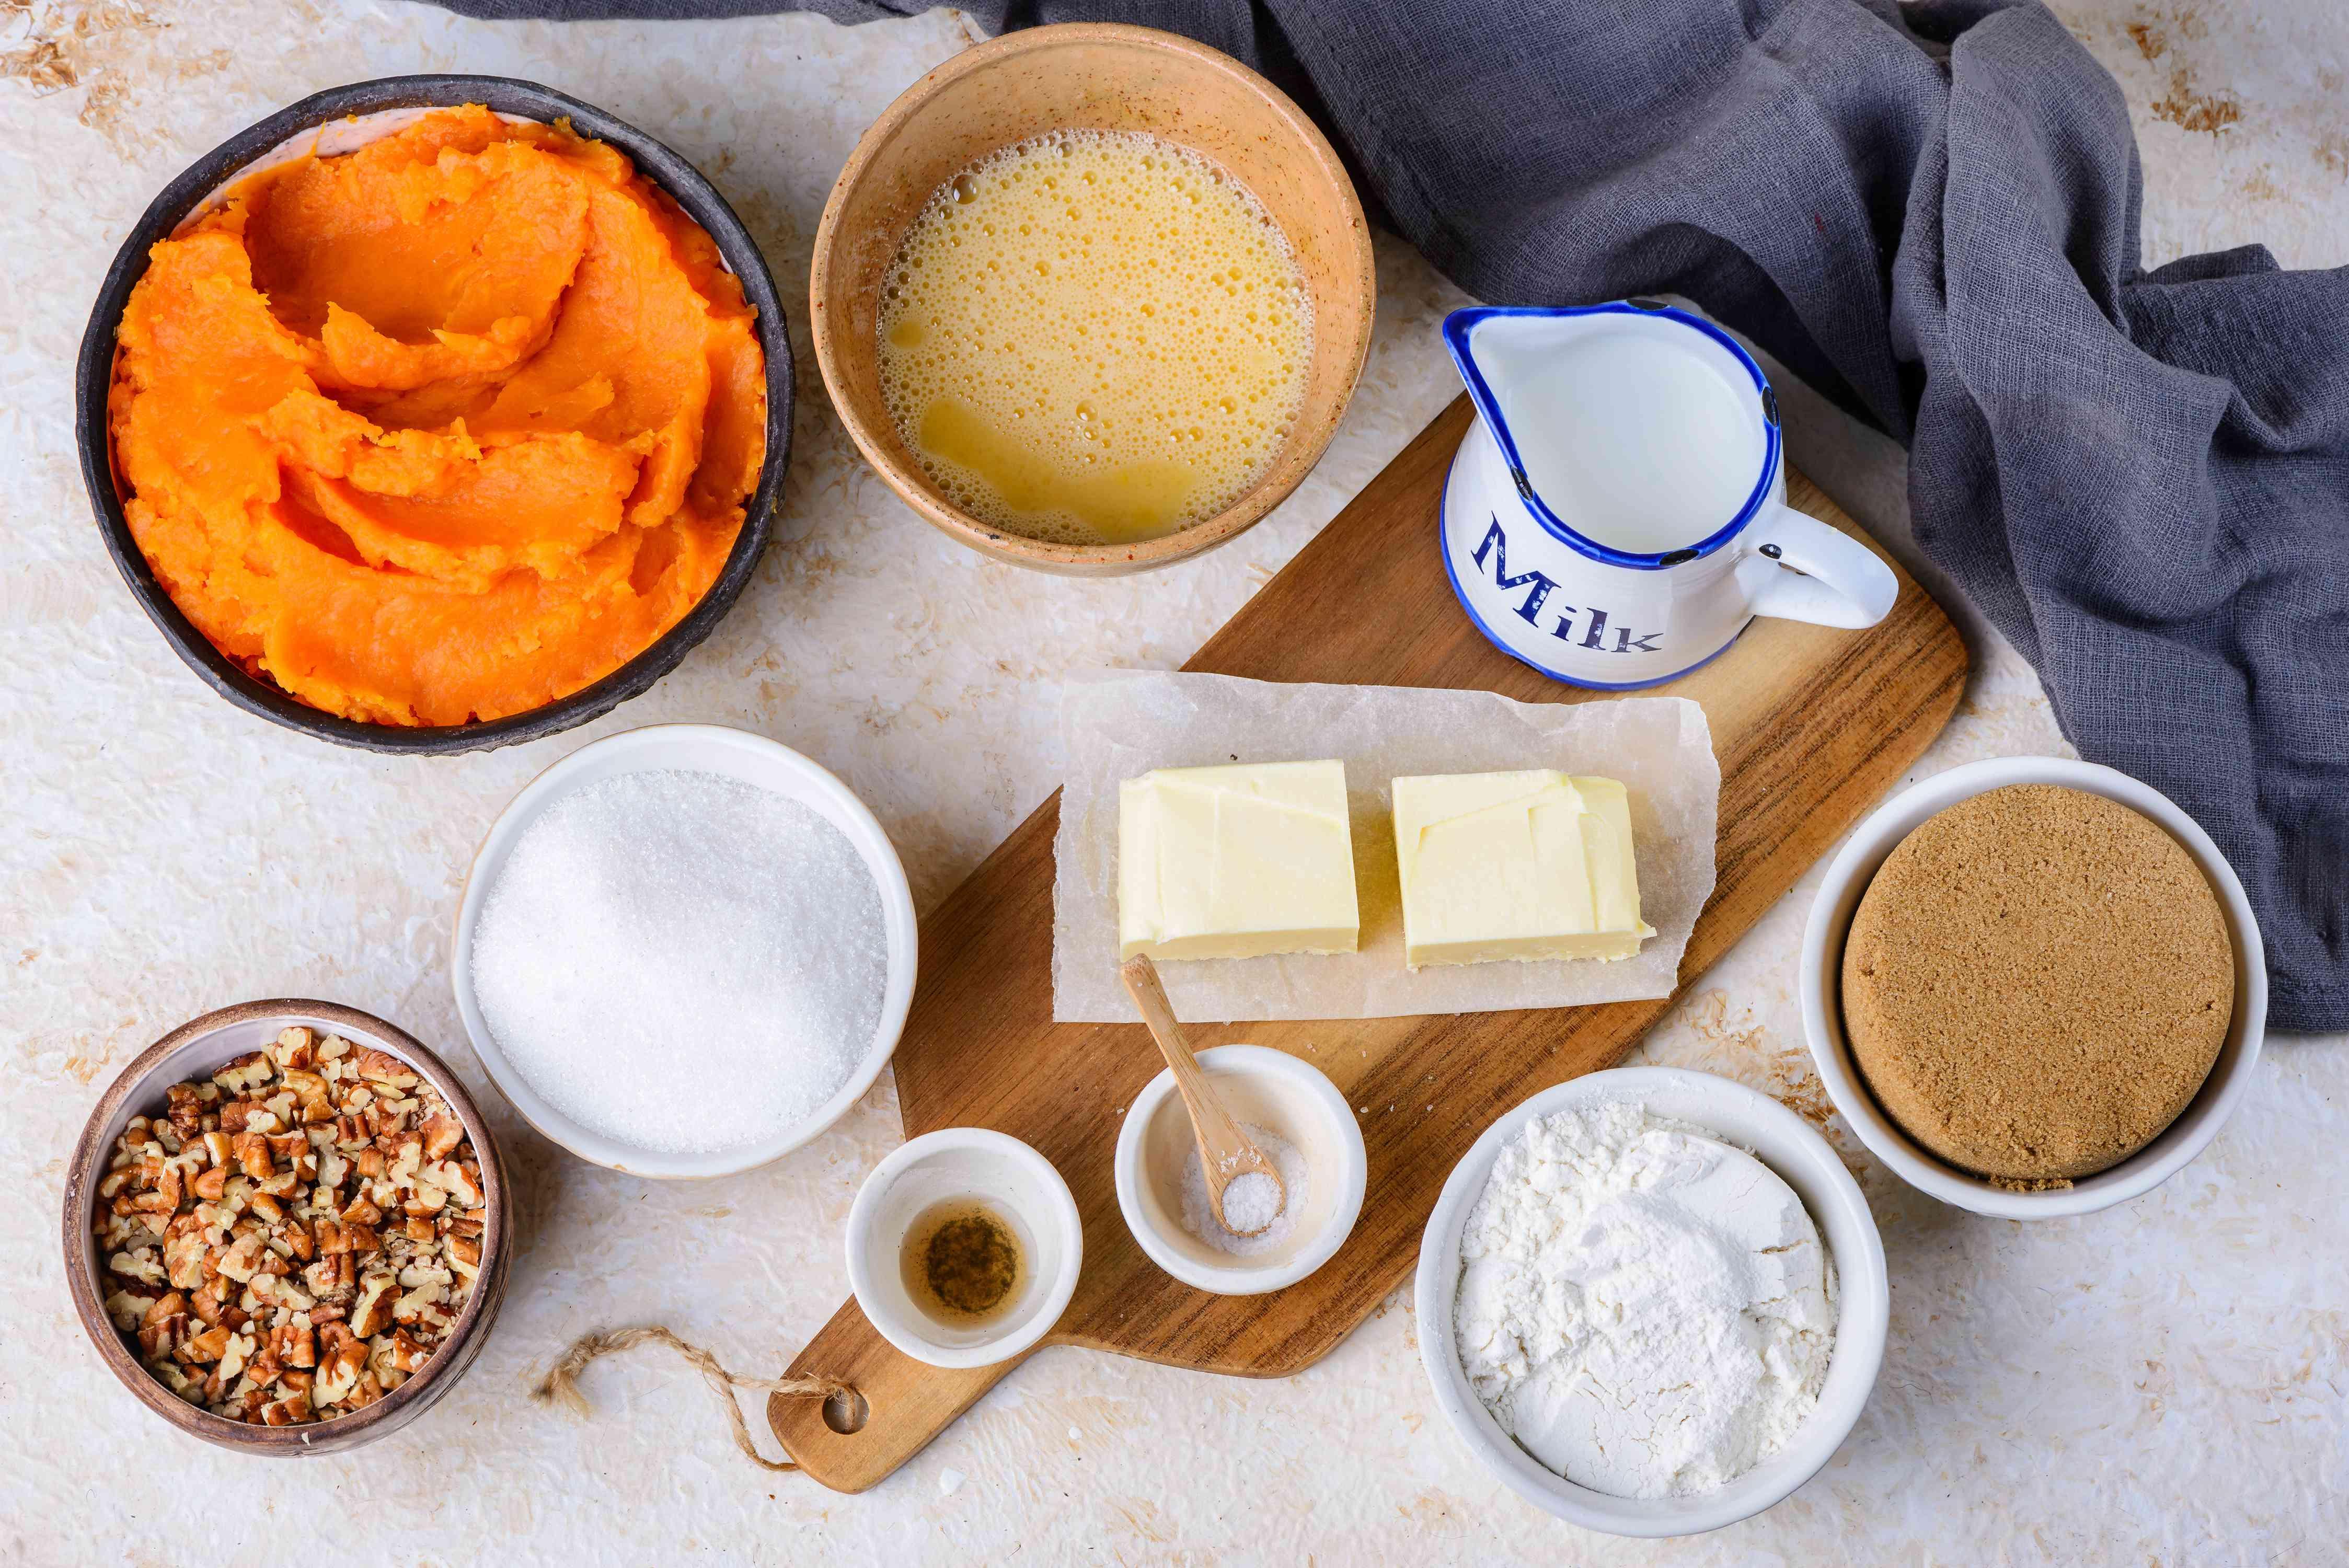 Ingredients for crunchy sweet potato casserole